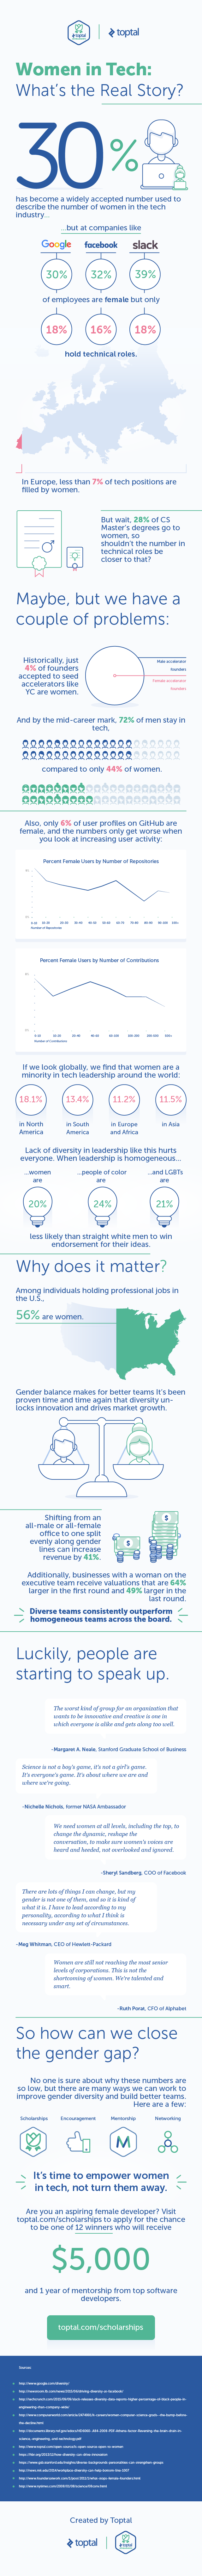 toptal-infographic